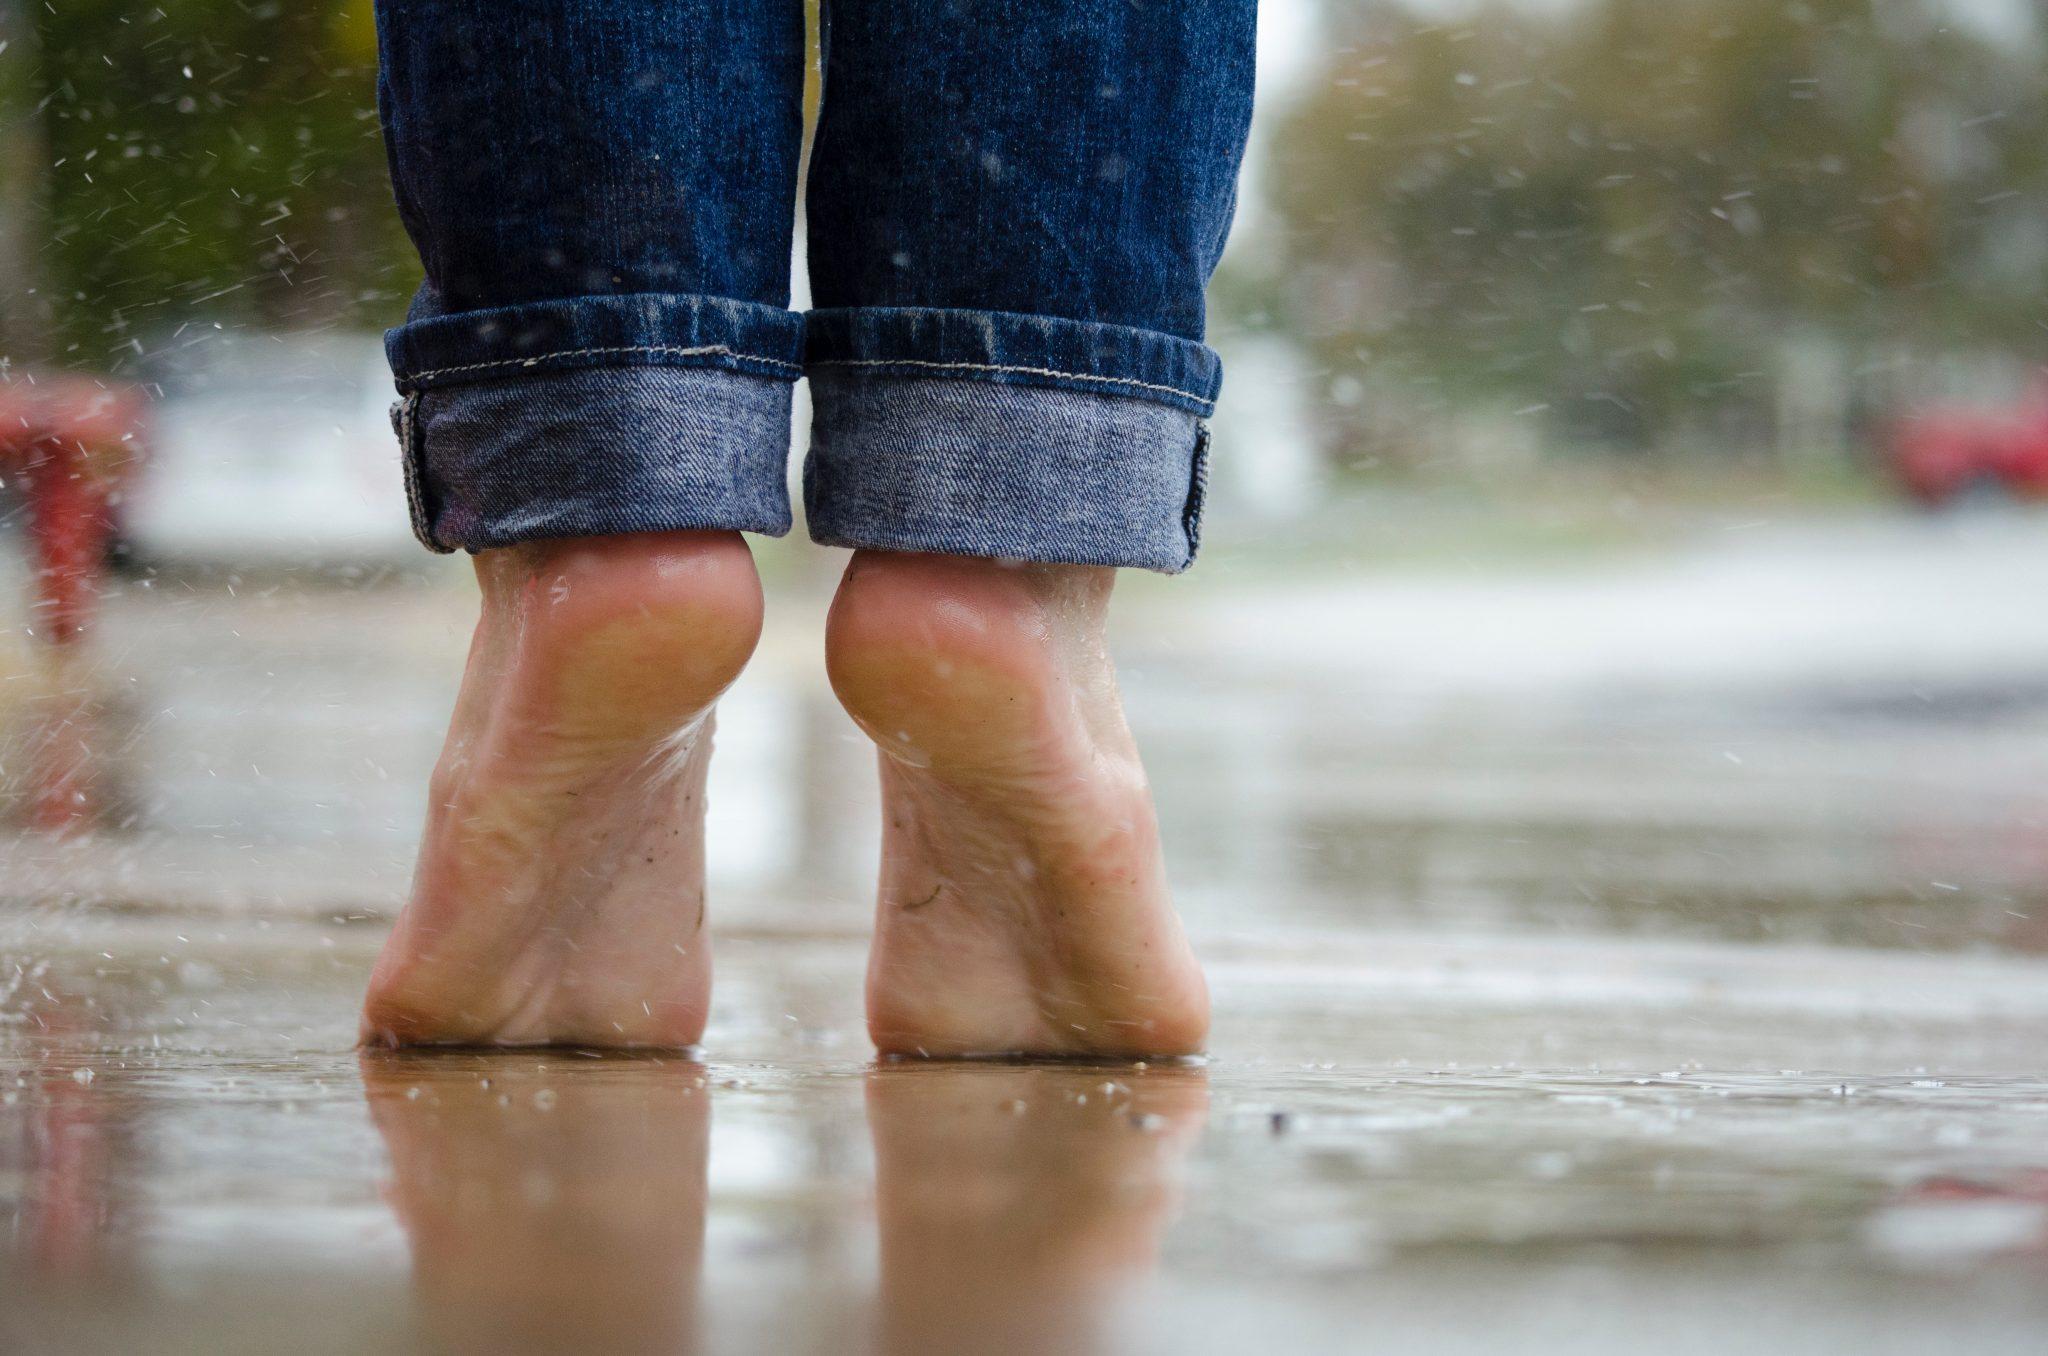 feet-rain-wet-puddle-105776